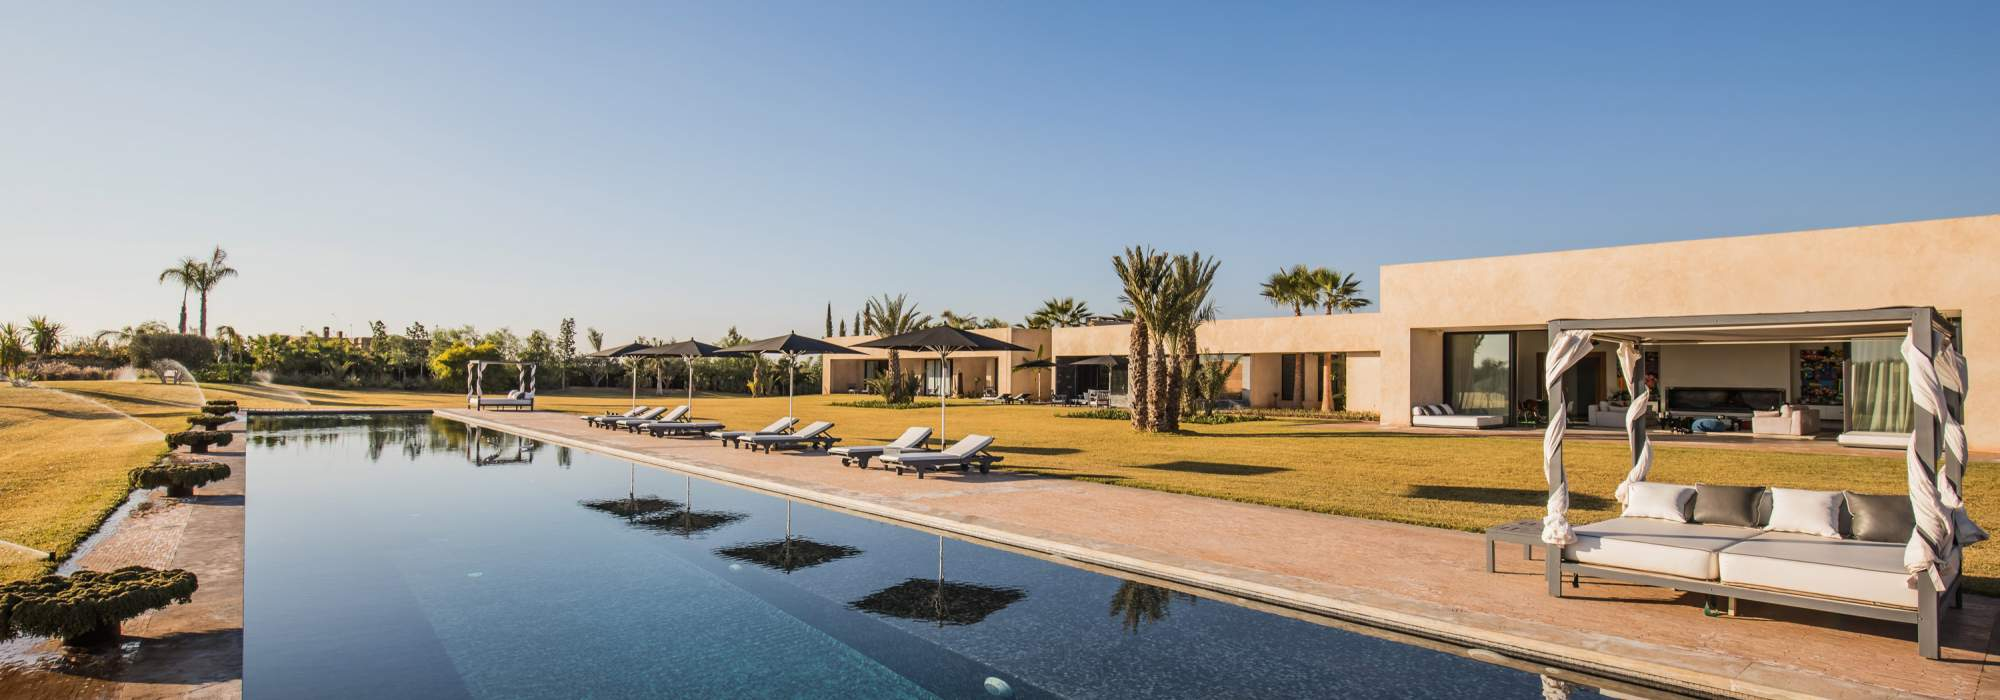 villa contemporaine a vendre route d'ouarzazate